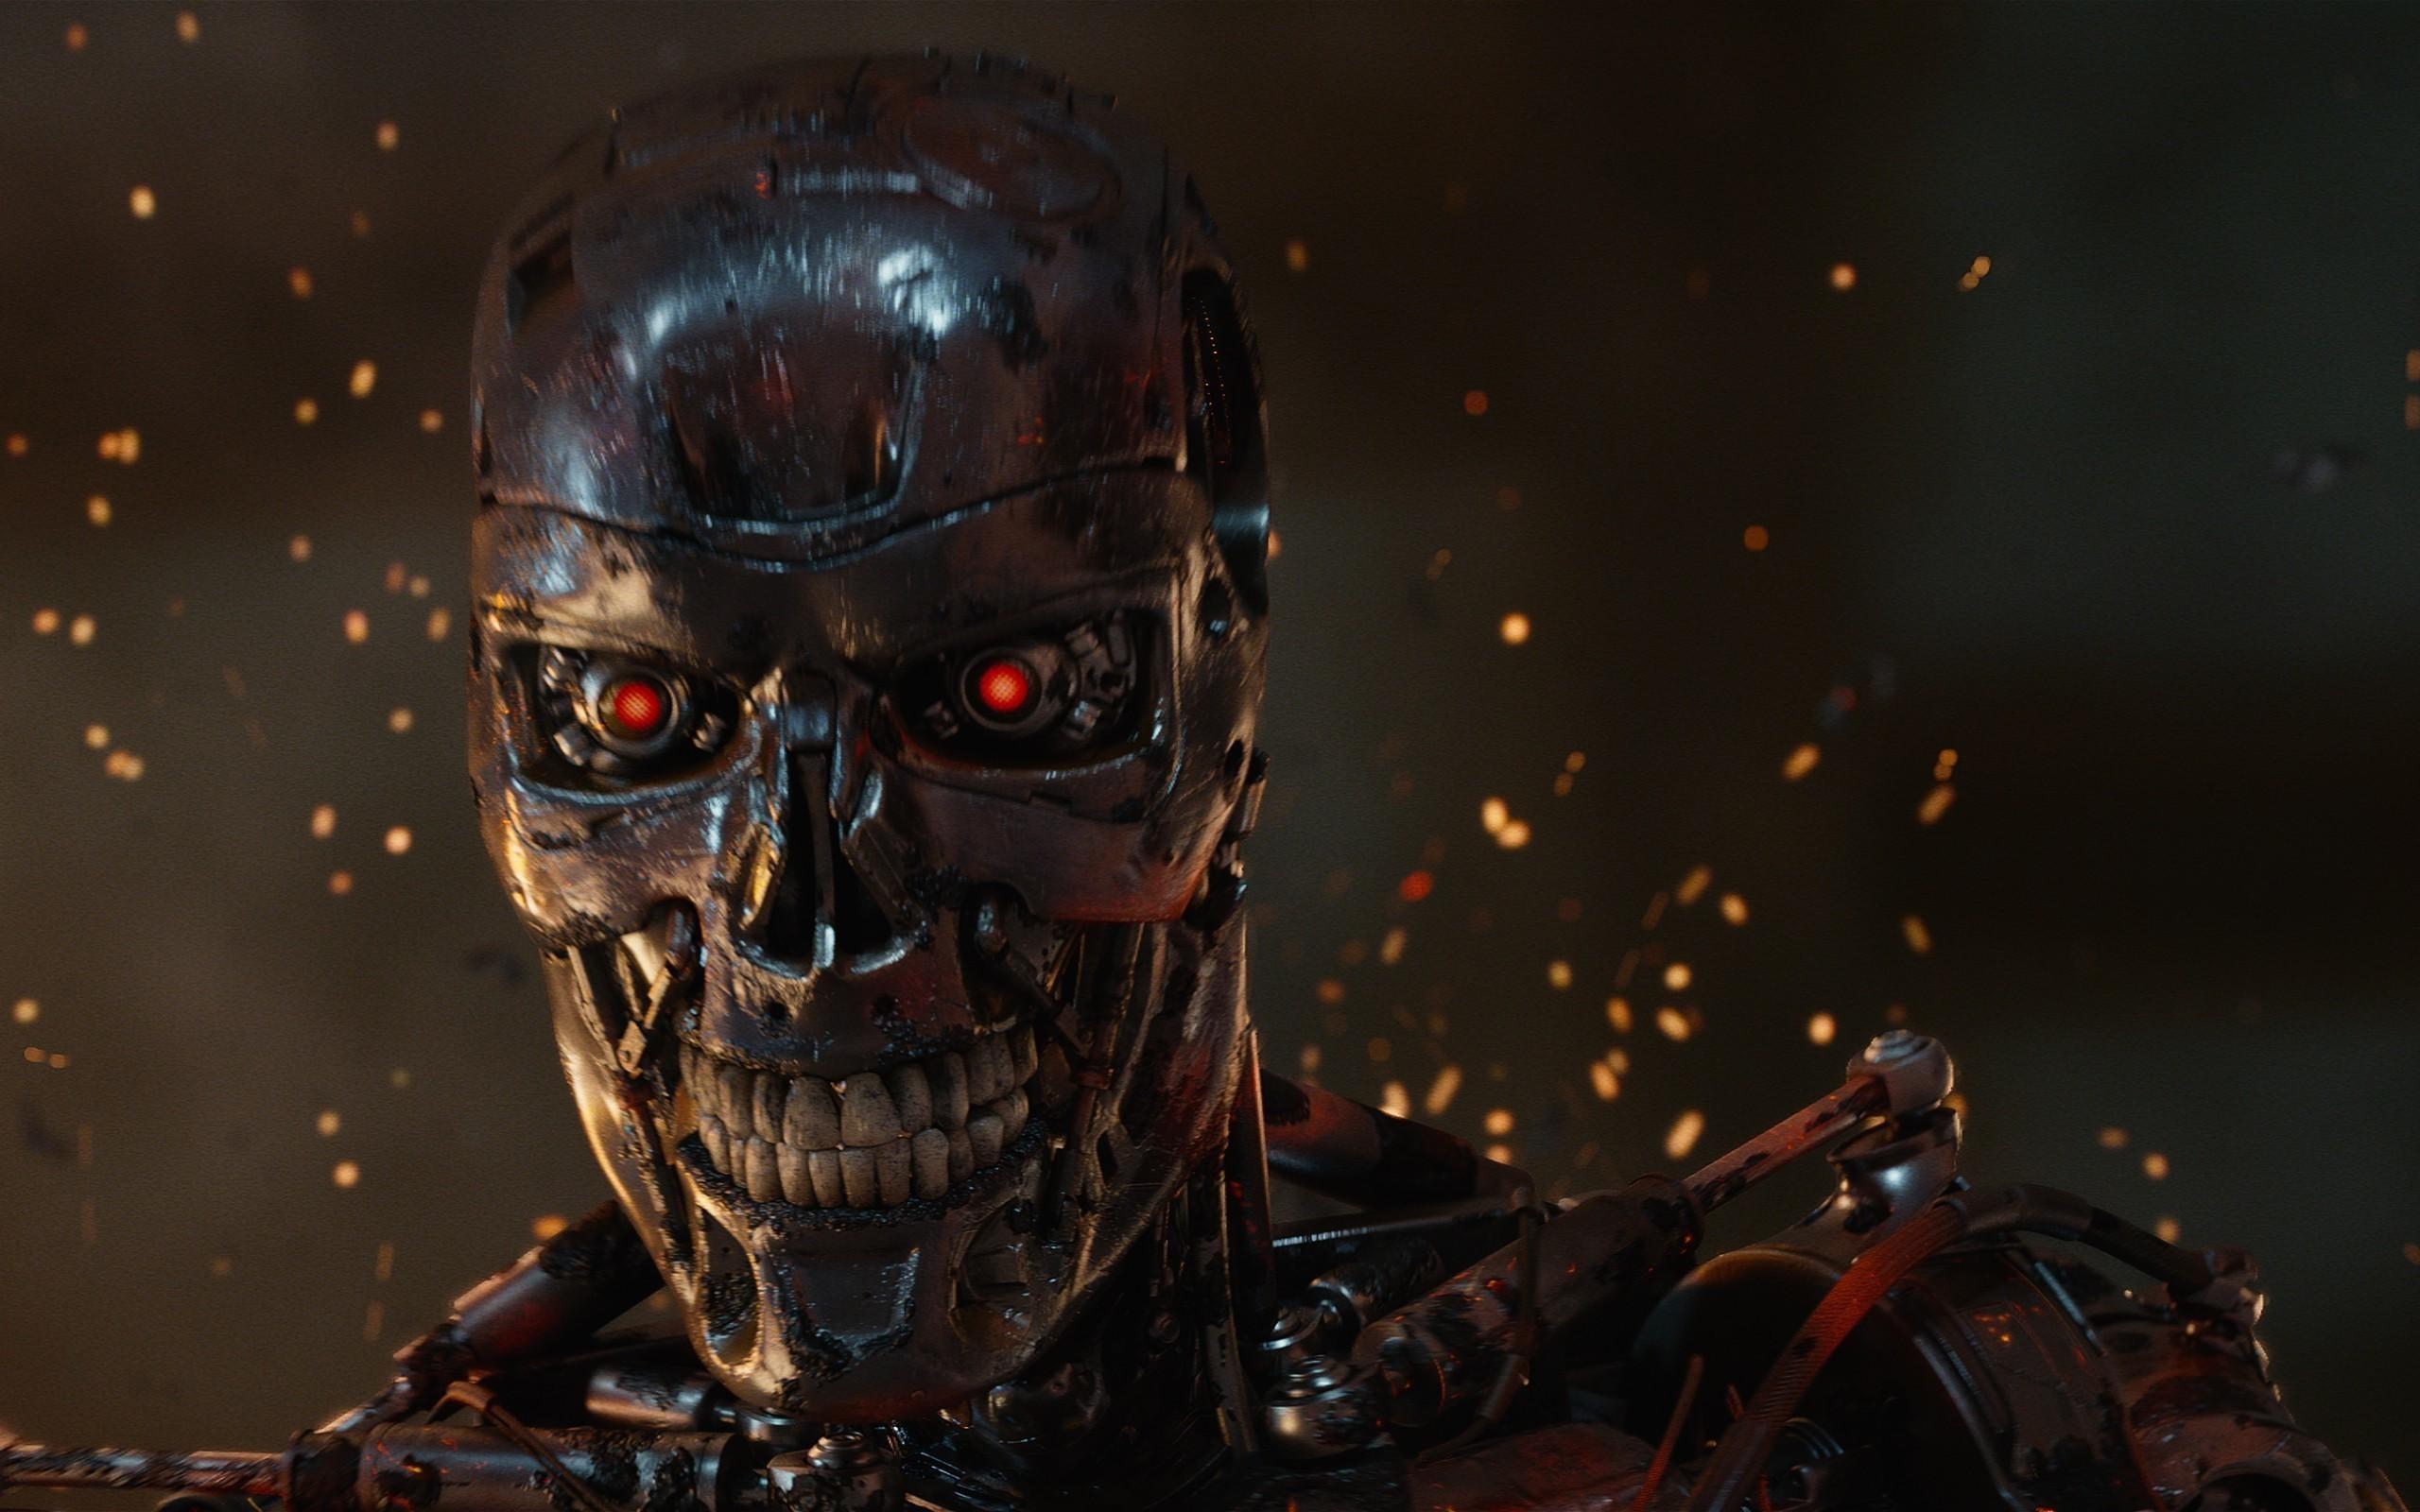 Terminator Genisys Wallpaper 79 Images